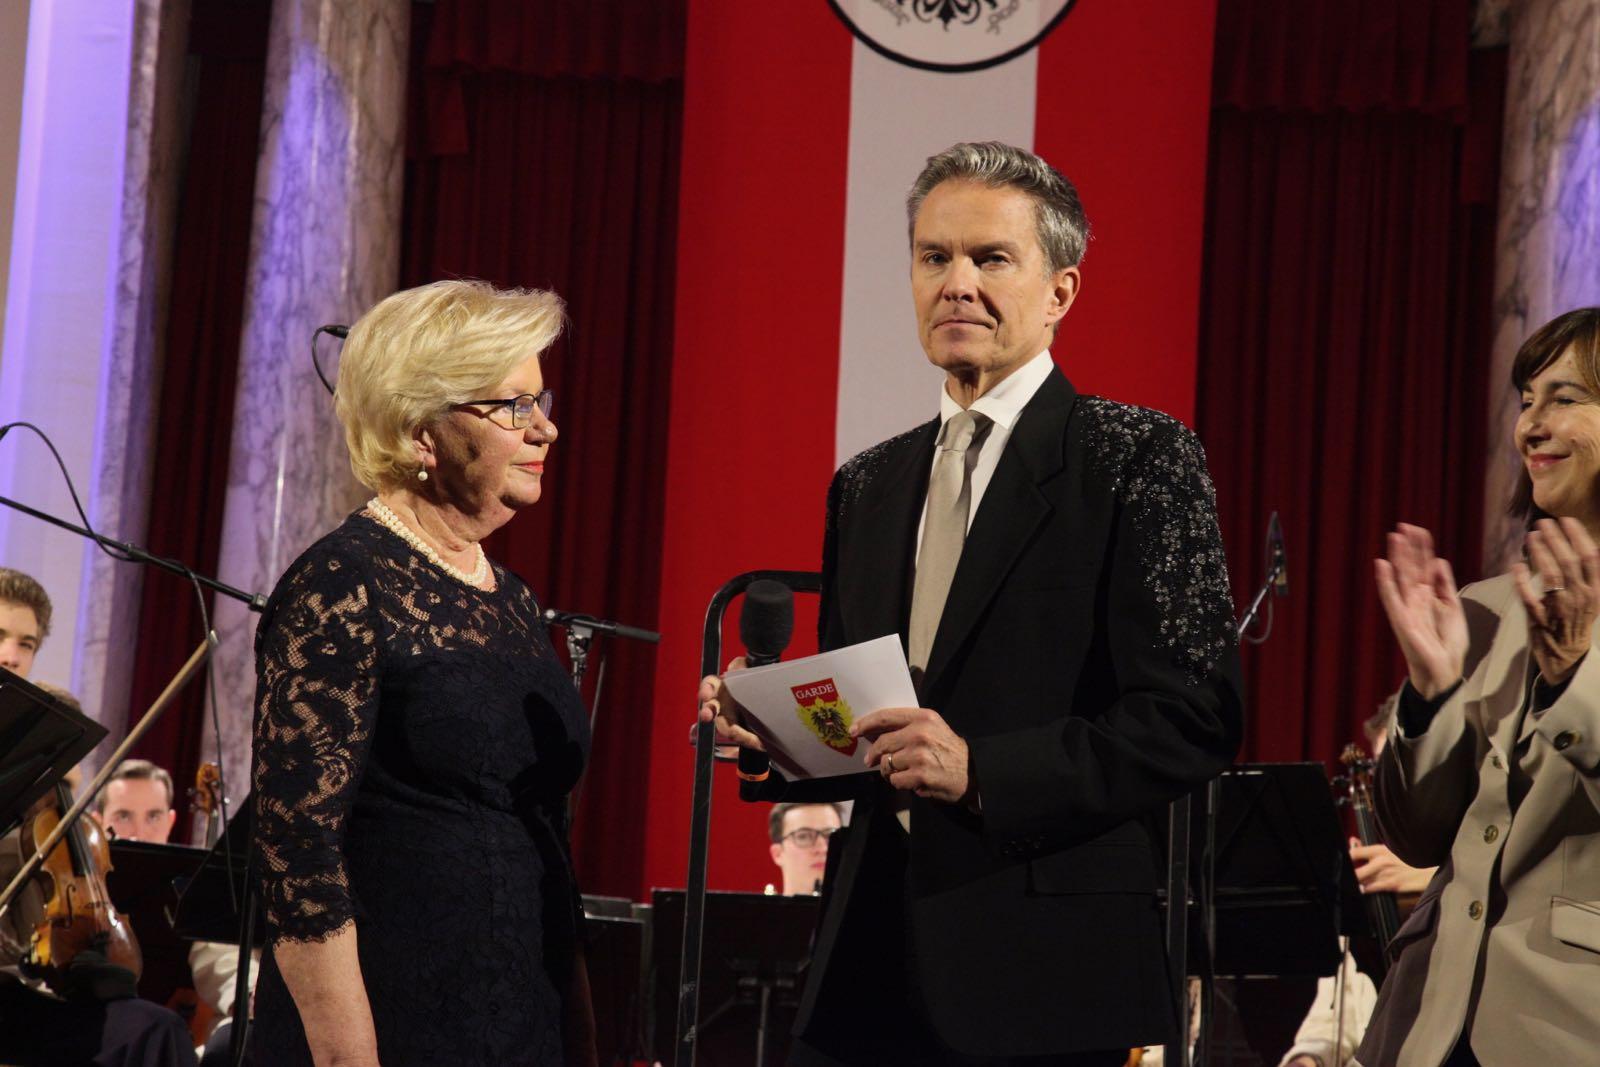 2019_03_14Gardemusik_Frühjahrskonzert_HBP_Hofburg - 71 of 177